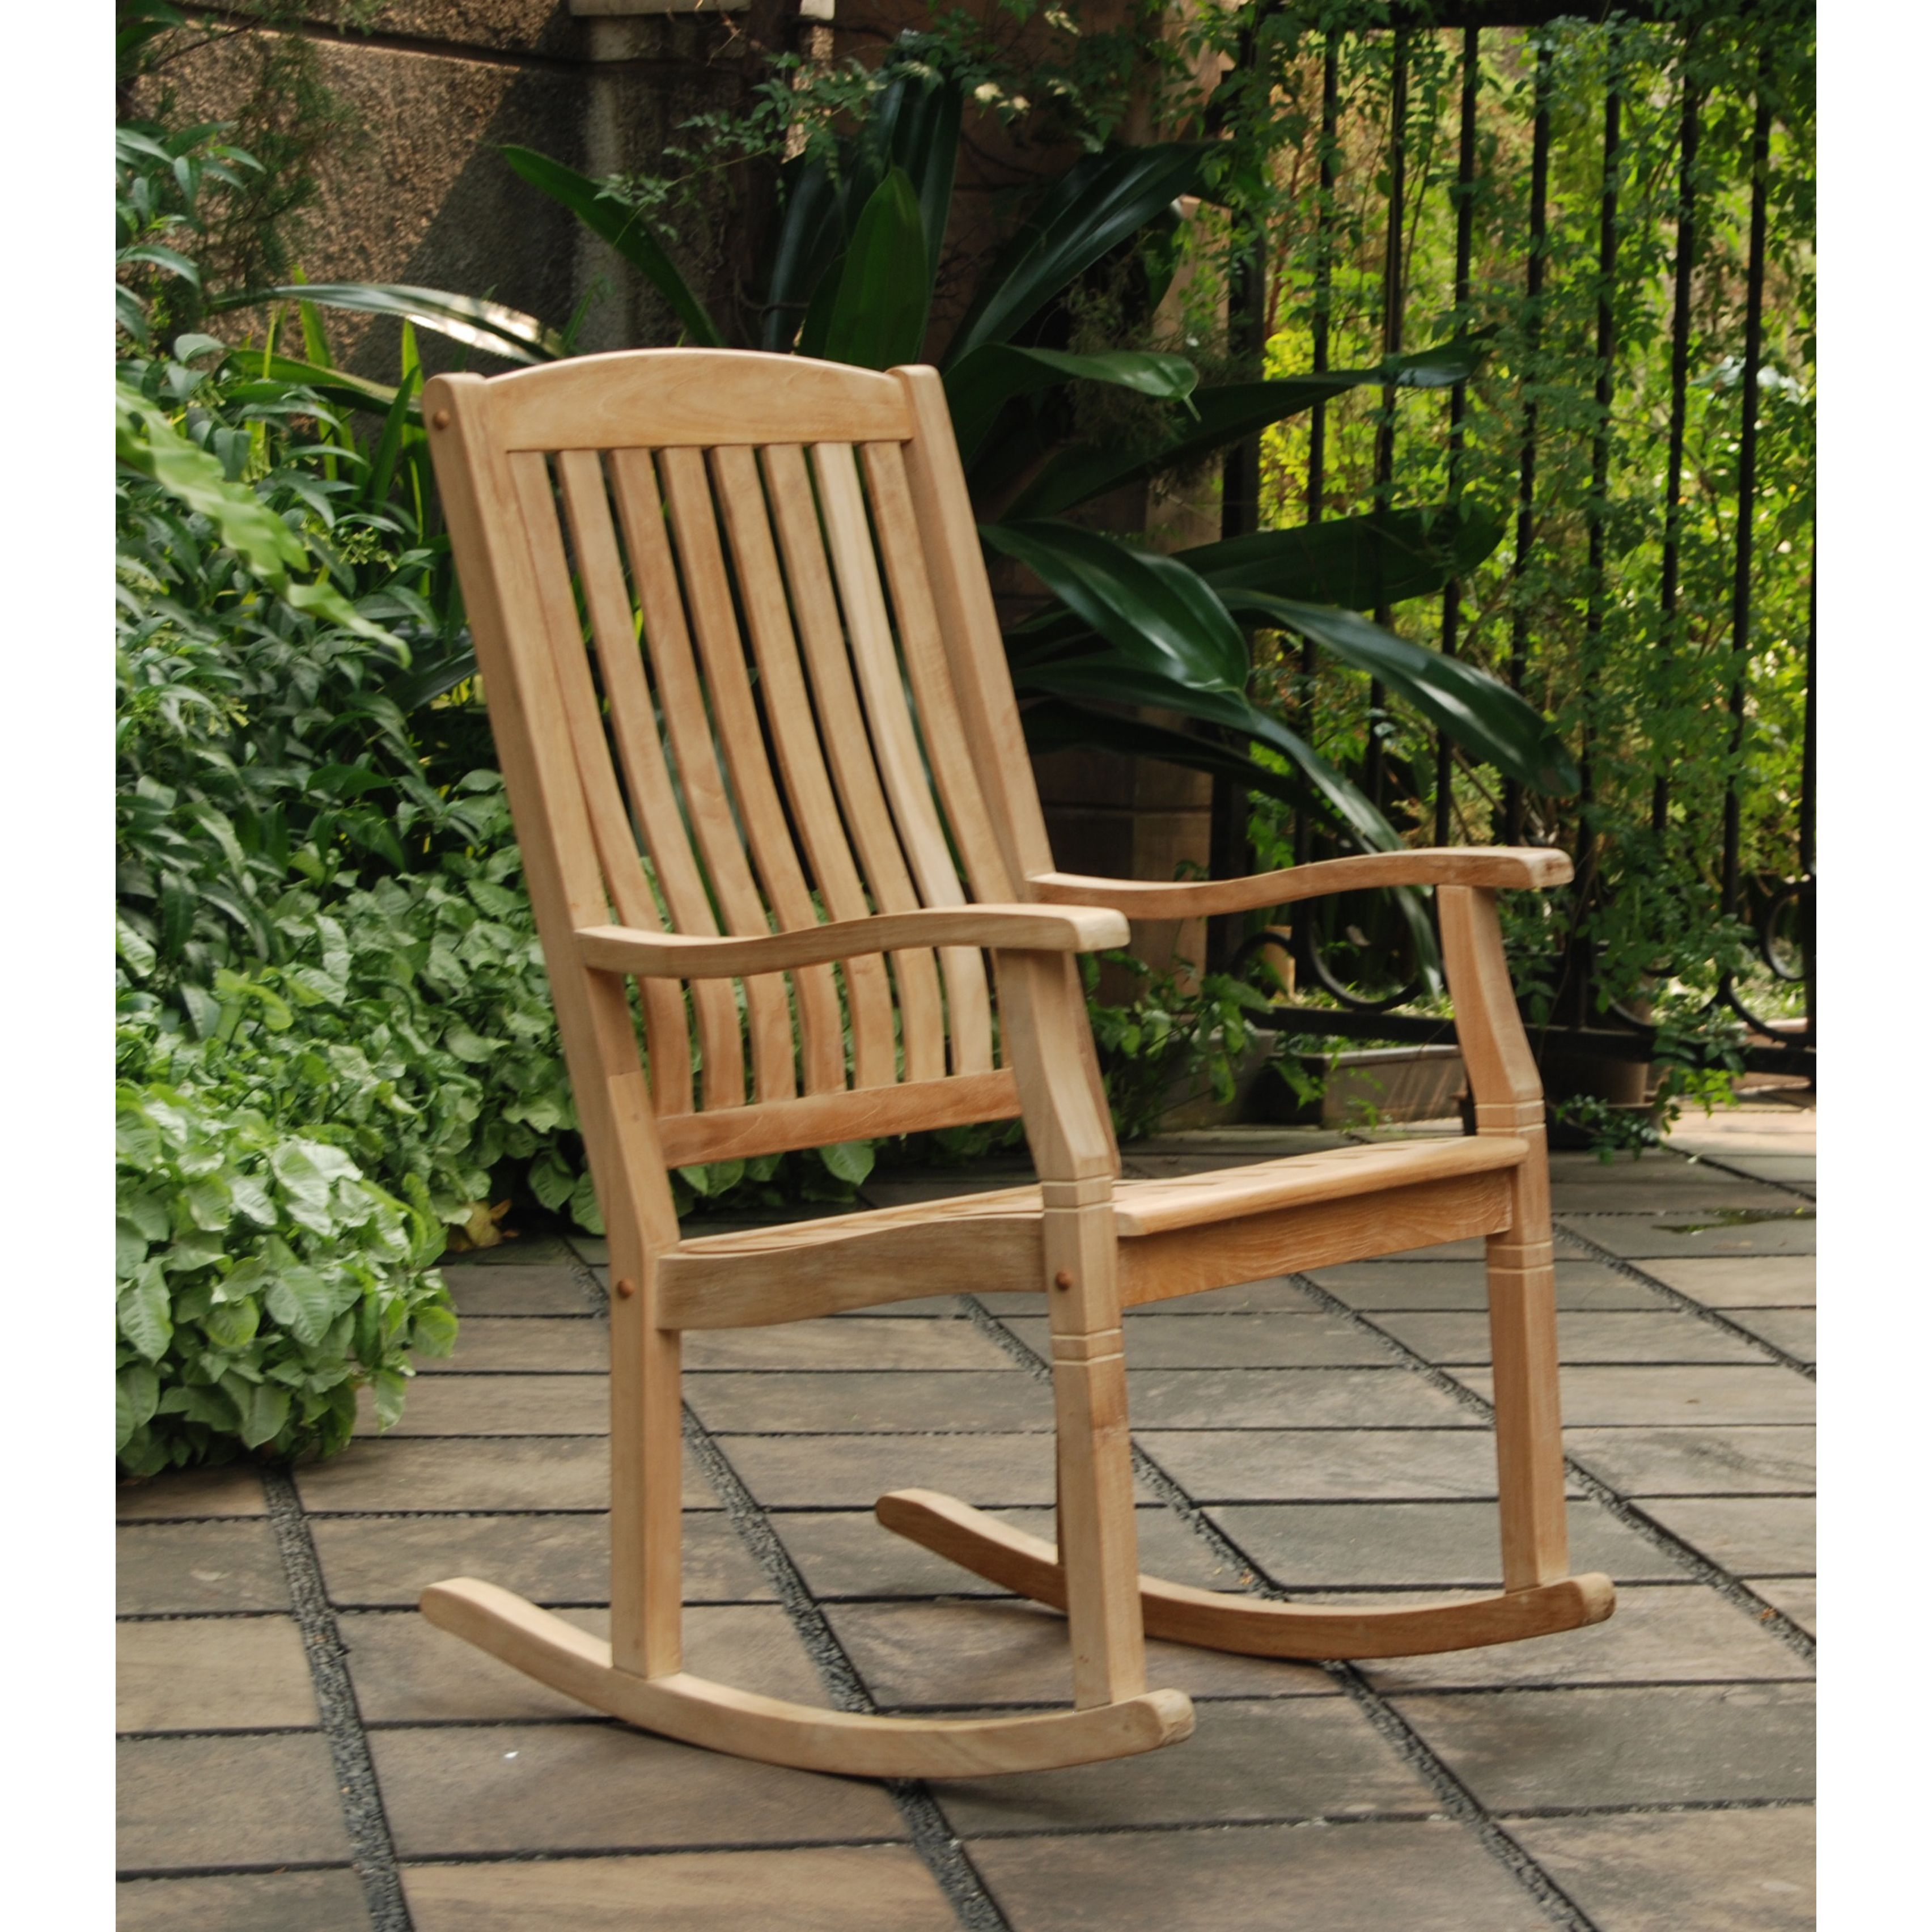 Cambridge Casual Sherwood Natural Teak Porch Rocking Chair With Regard To Natural Brown Wood Folding Rocking Chairs (#7 of 20)